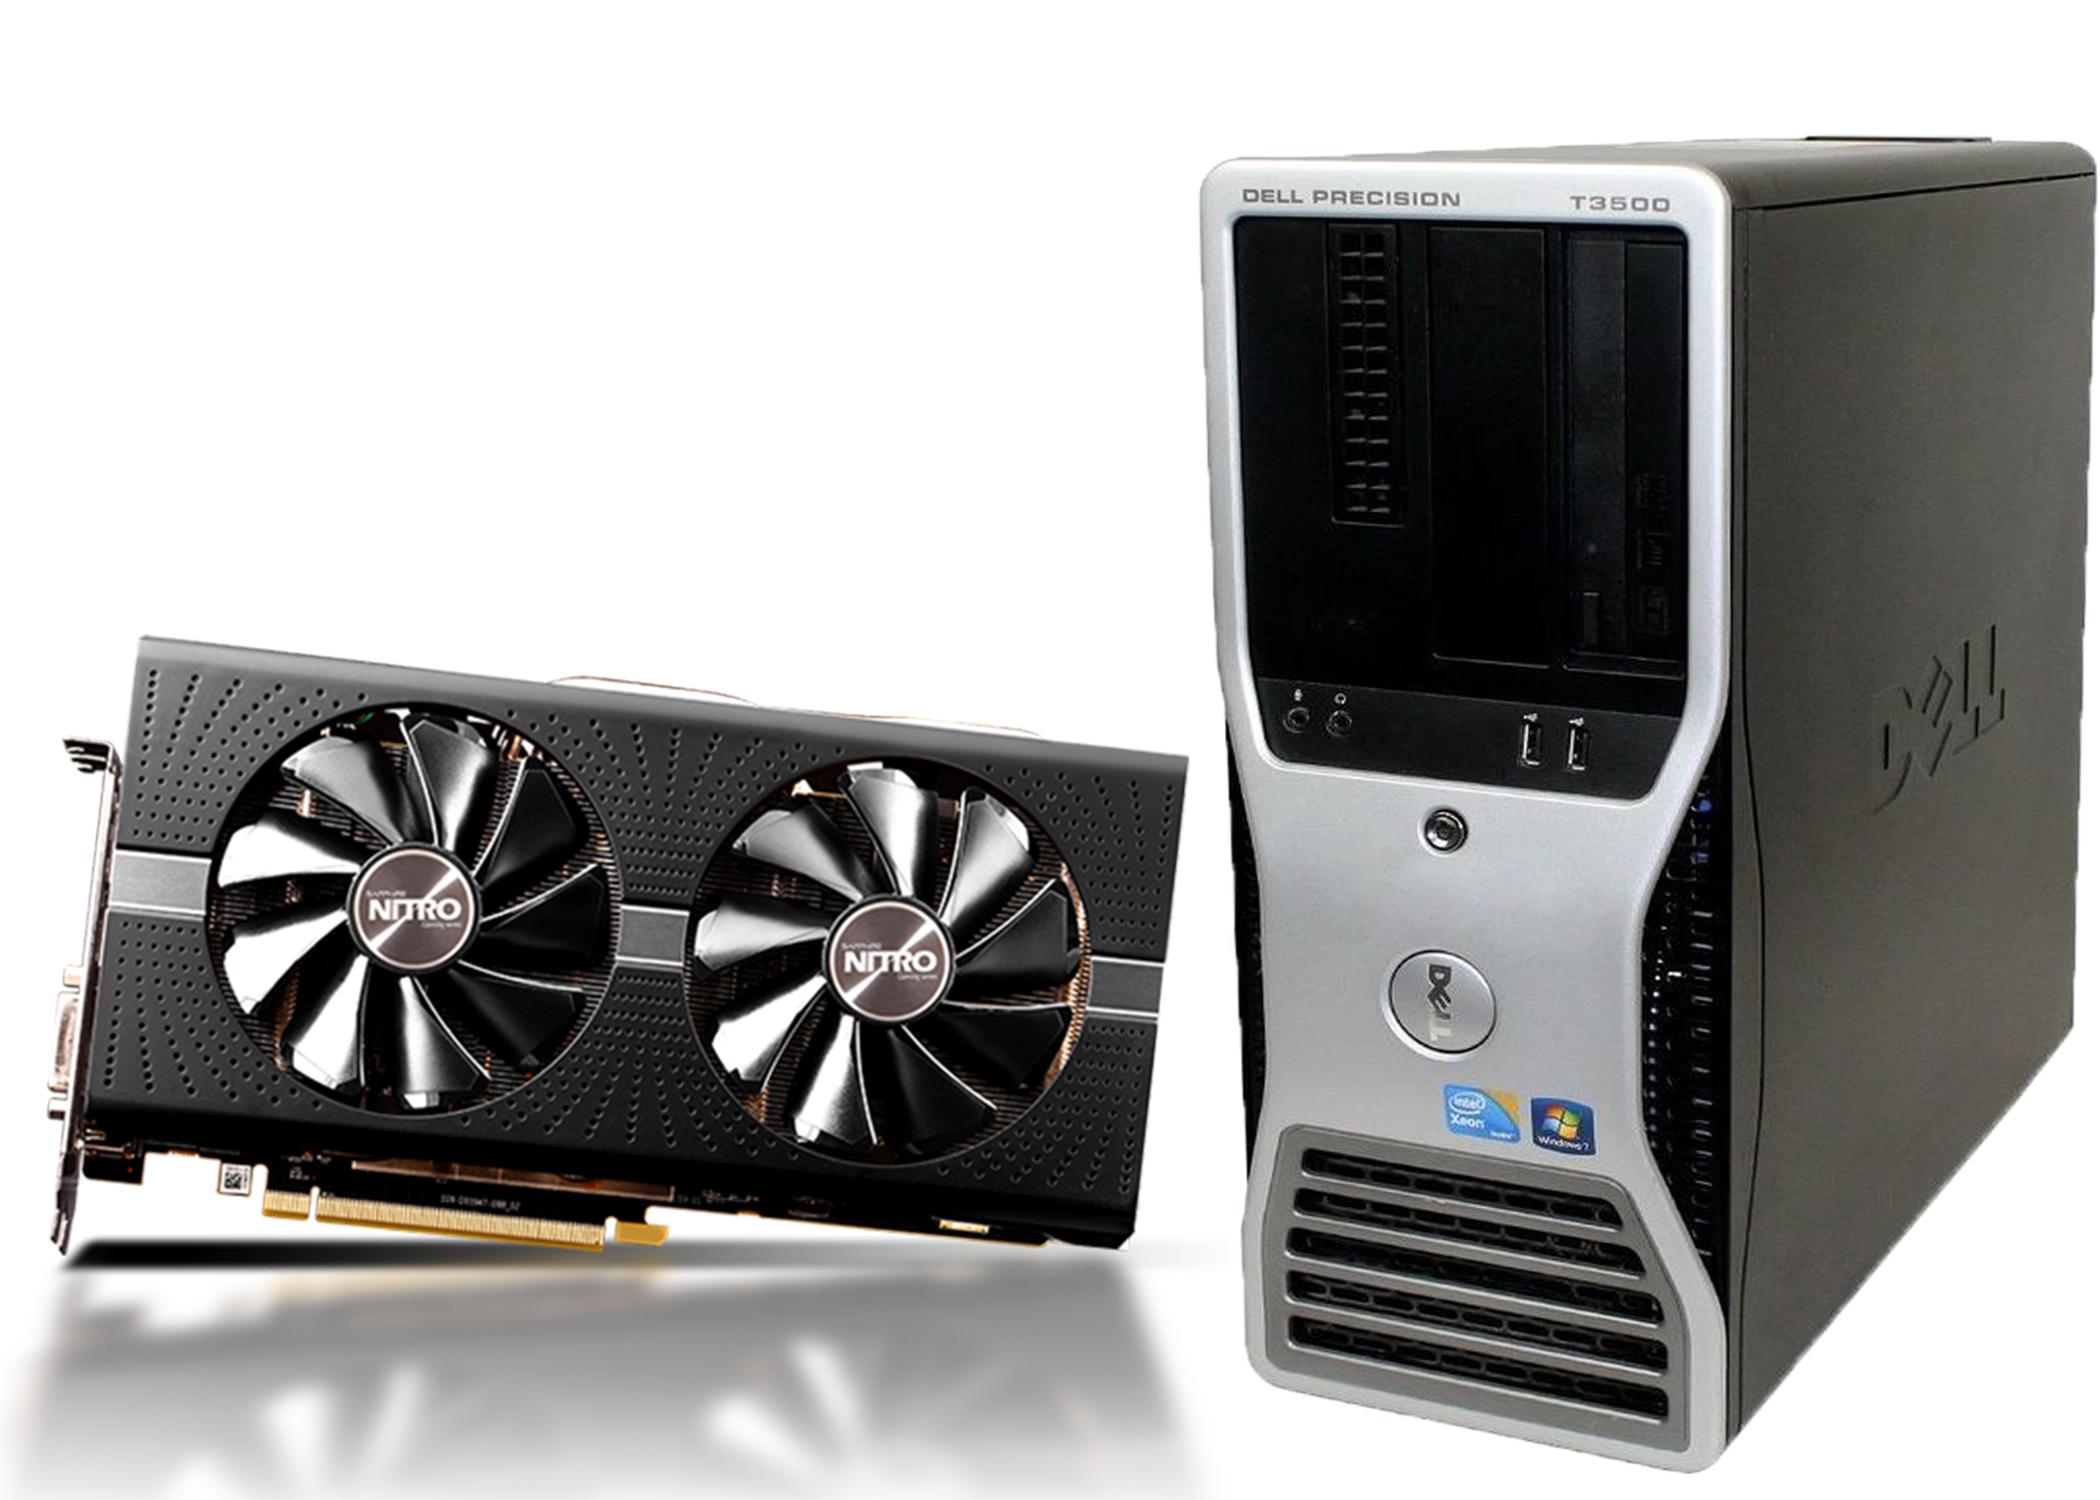 DELL T3500 أقوى كيسة وورك ستيشن للألعاب و البرامج - كارت RX 580 - هاردين - رام 16 جيجا